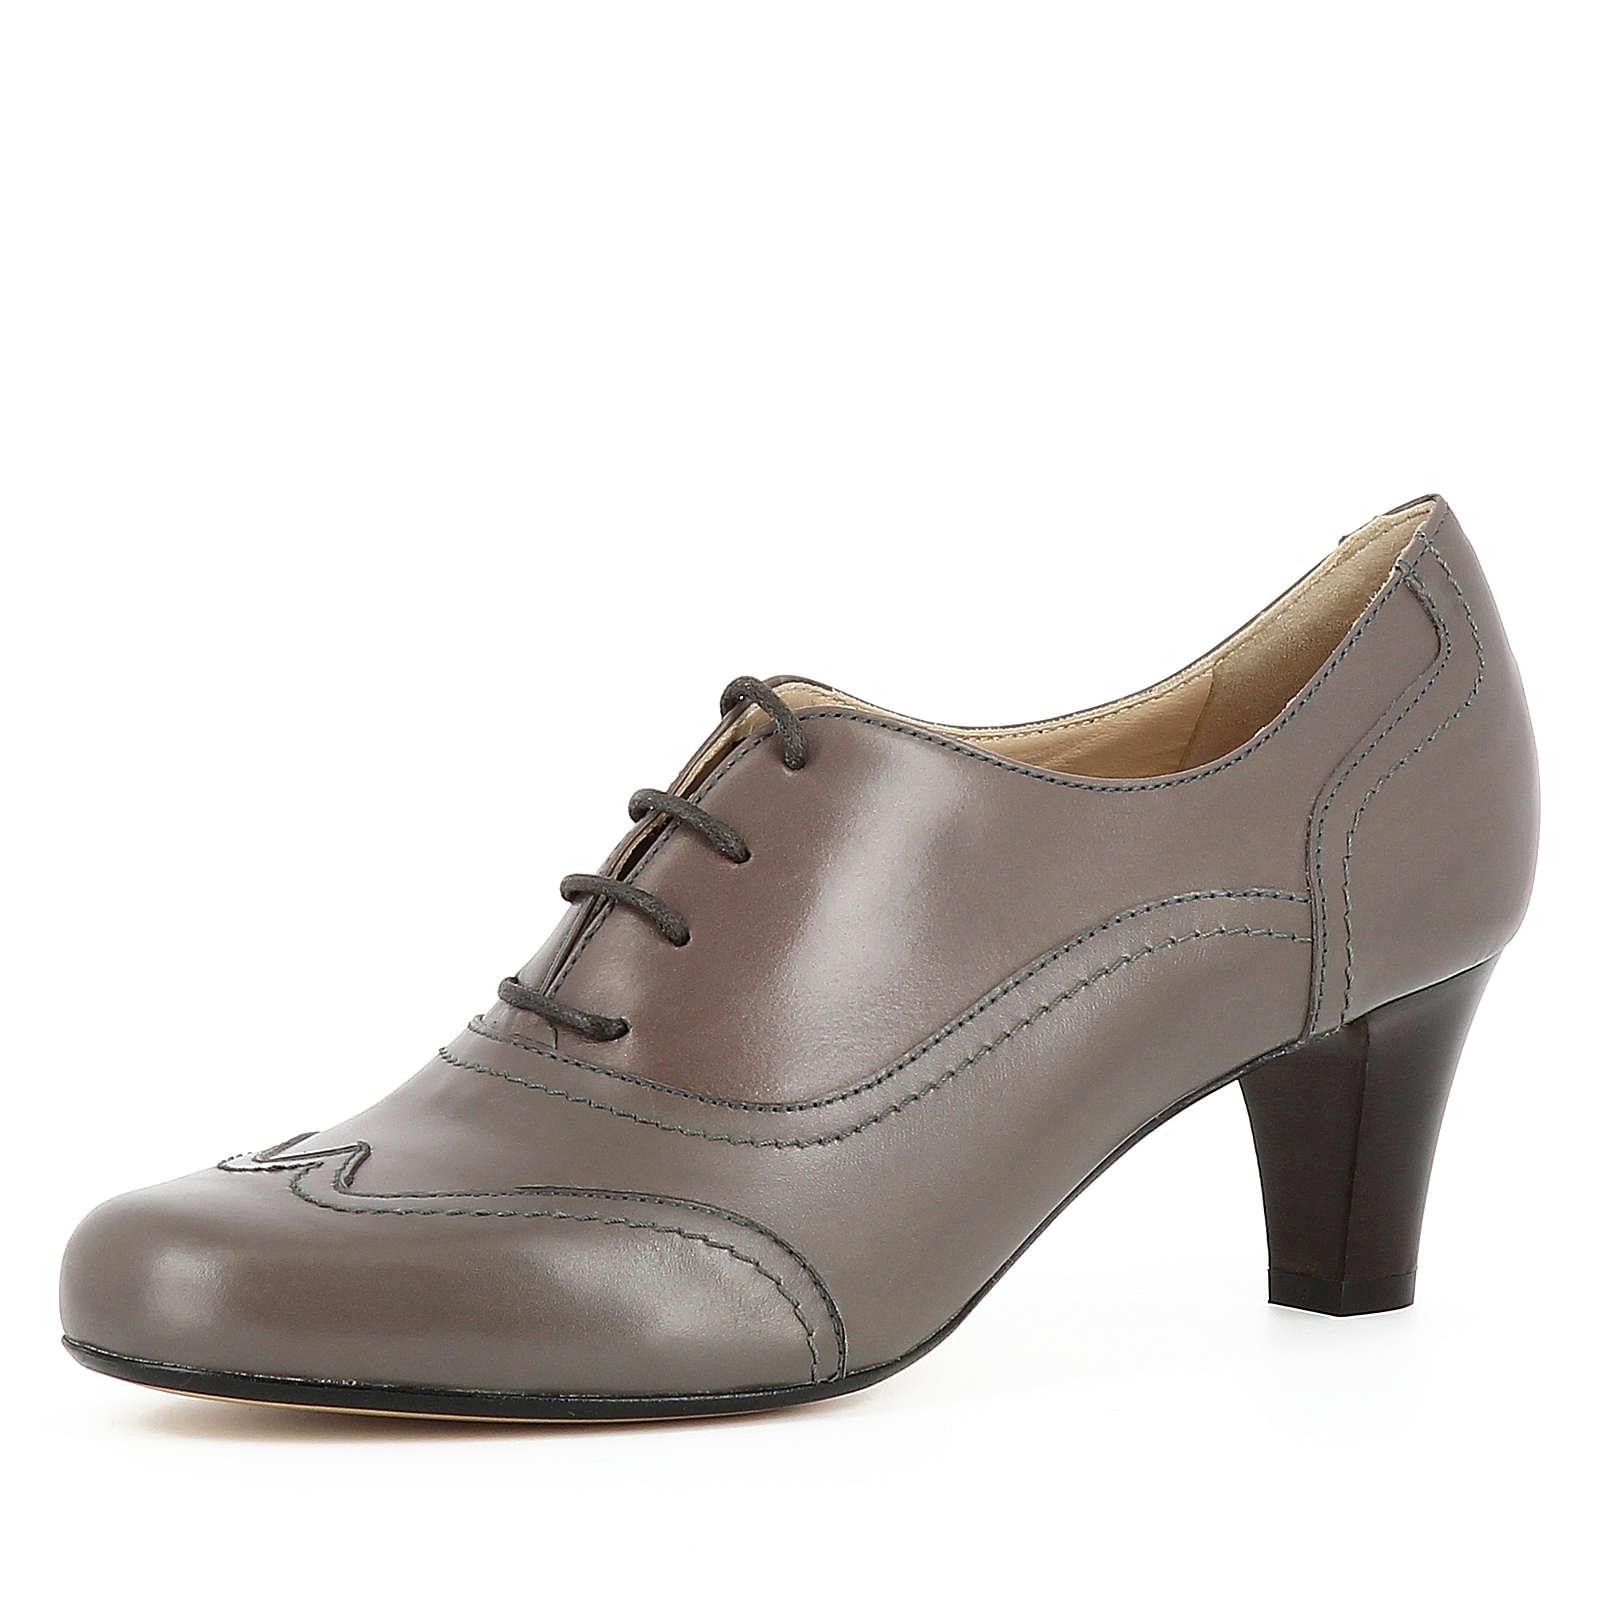 Evita Shoes GIUSY Schnürpumps taupe Damen Gr. 35